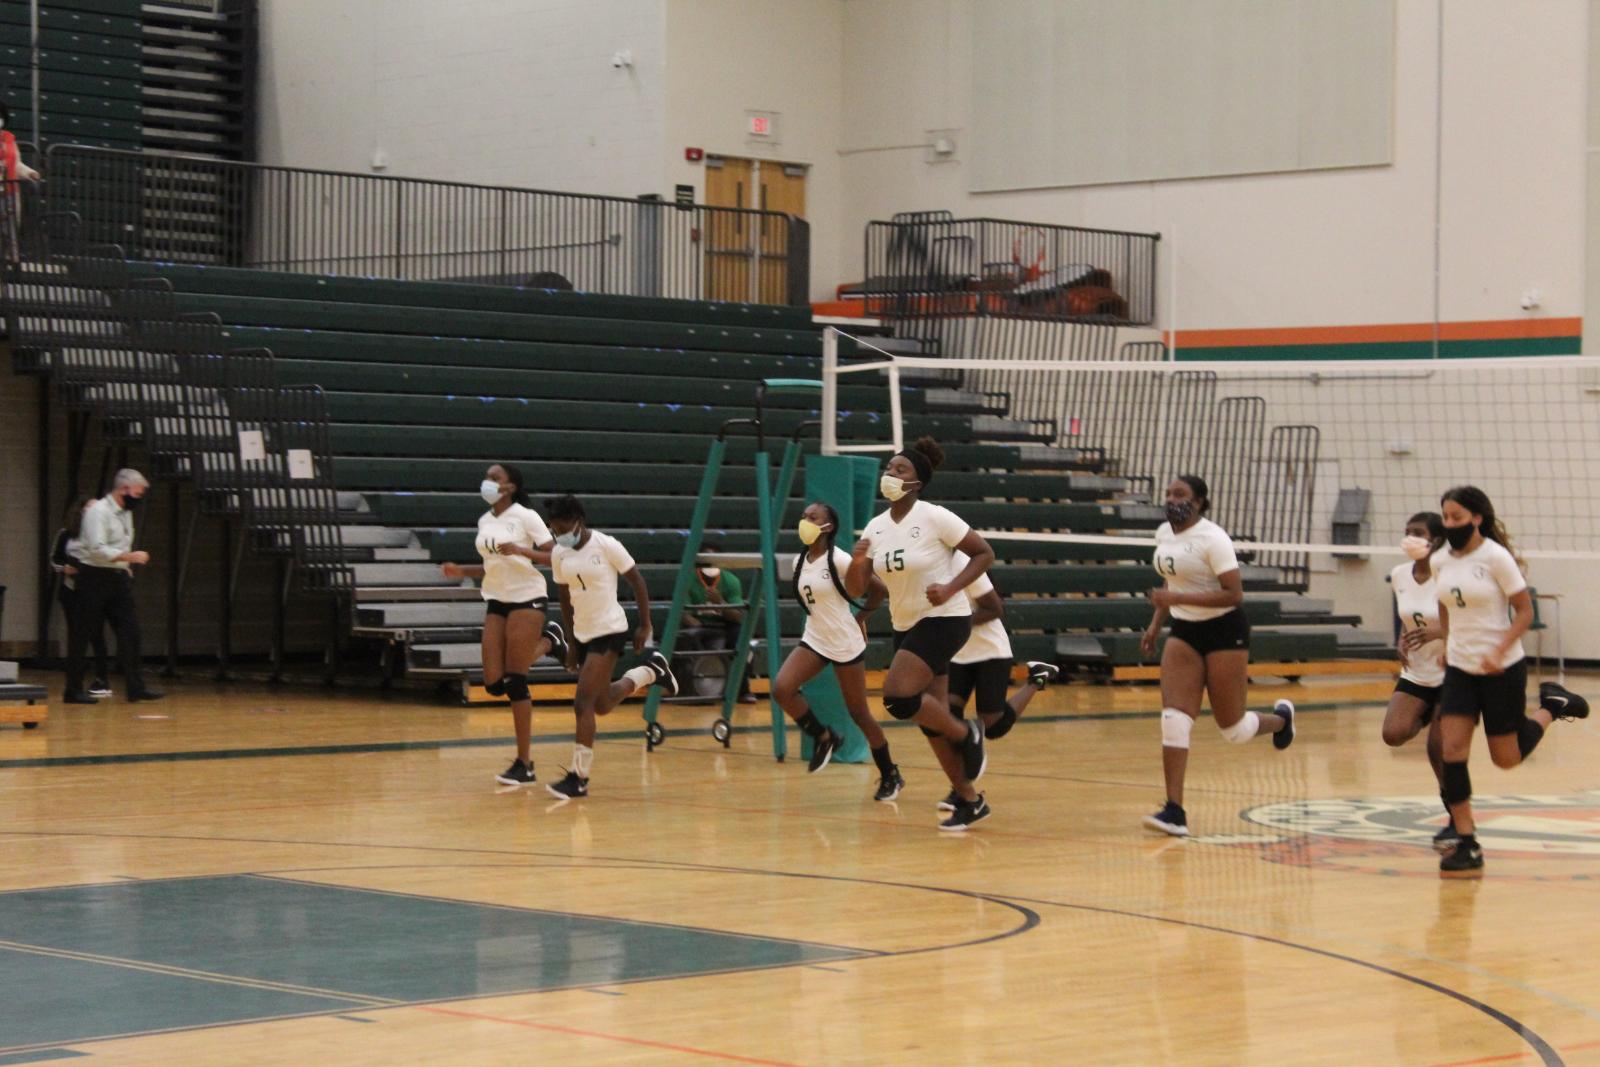 [2020.09.17] Girls Volleyball @ Jones